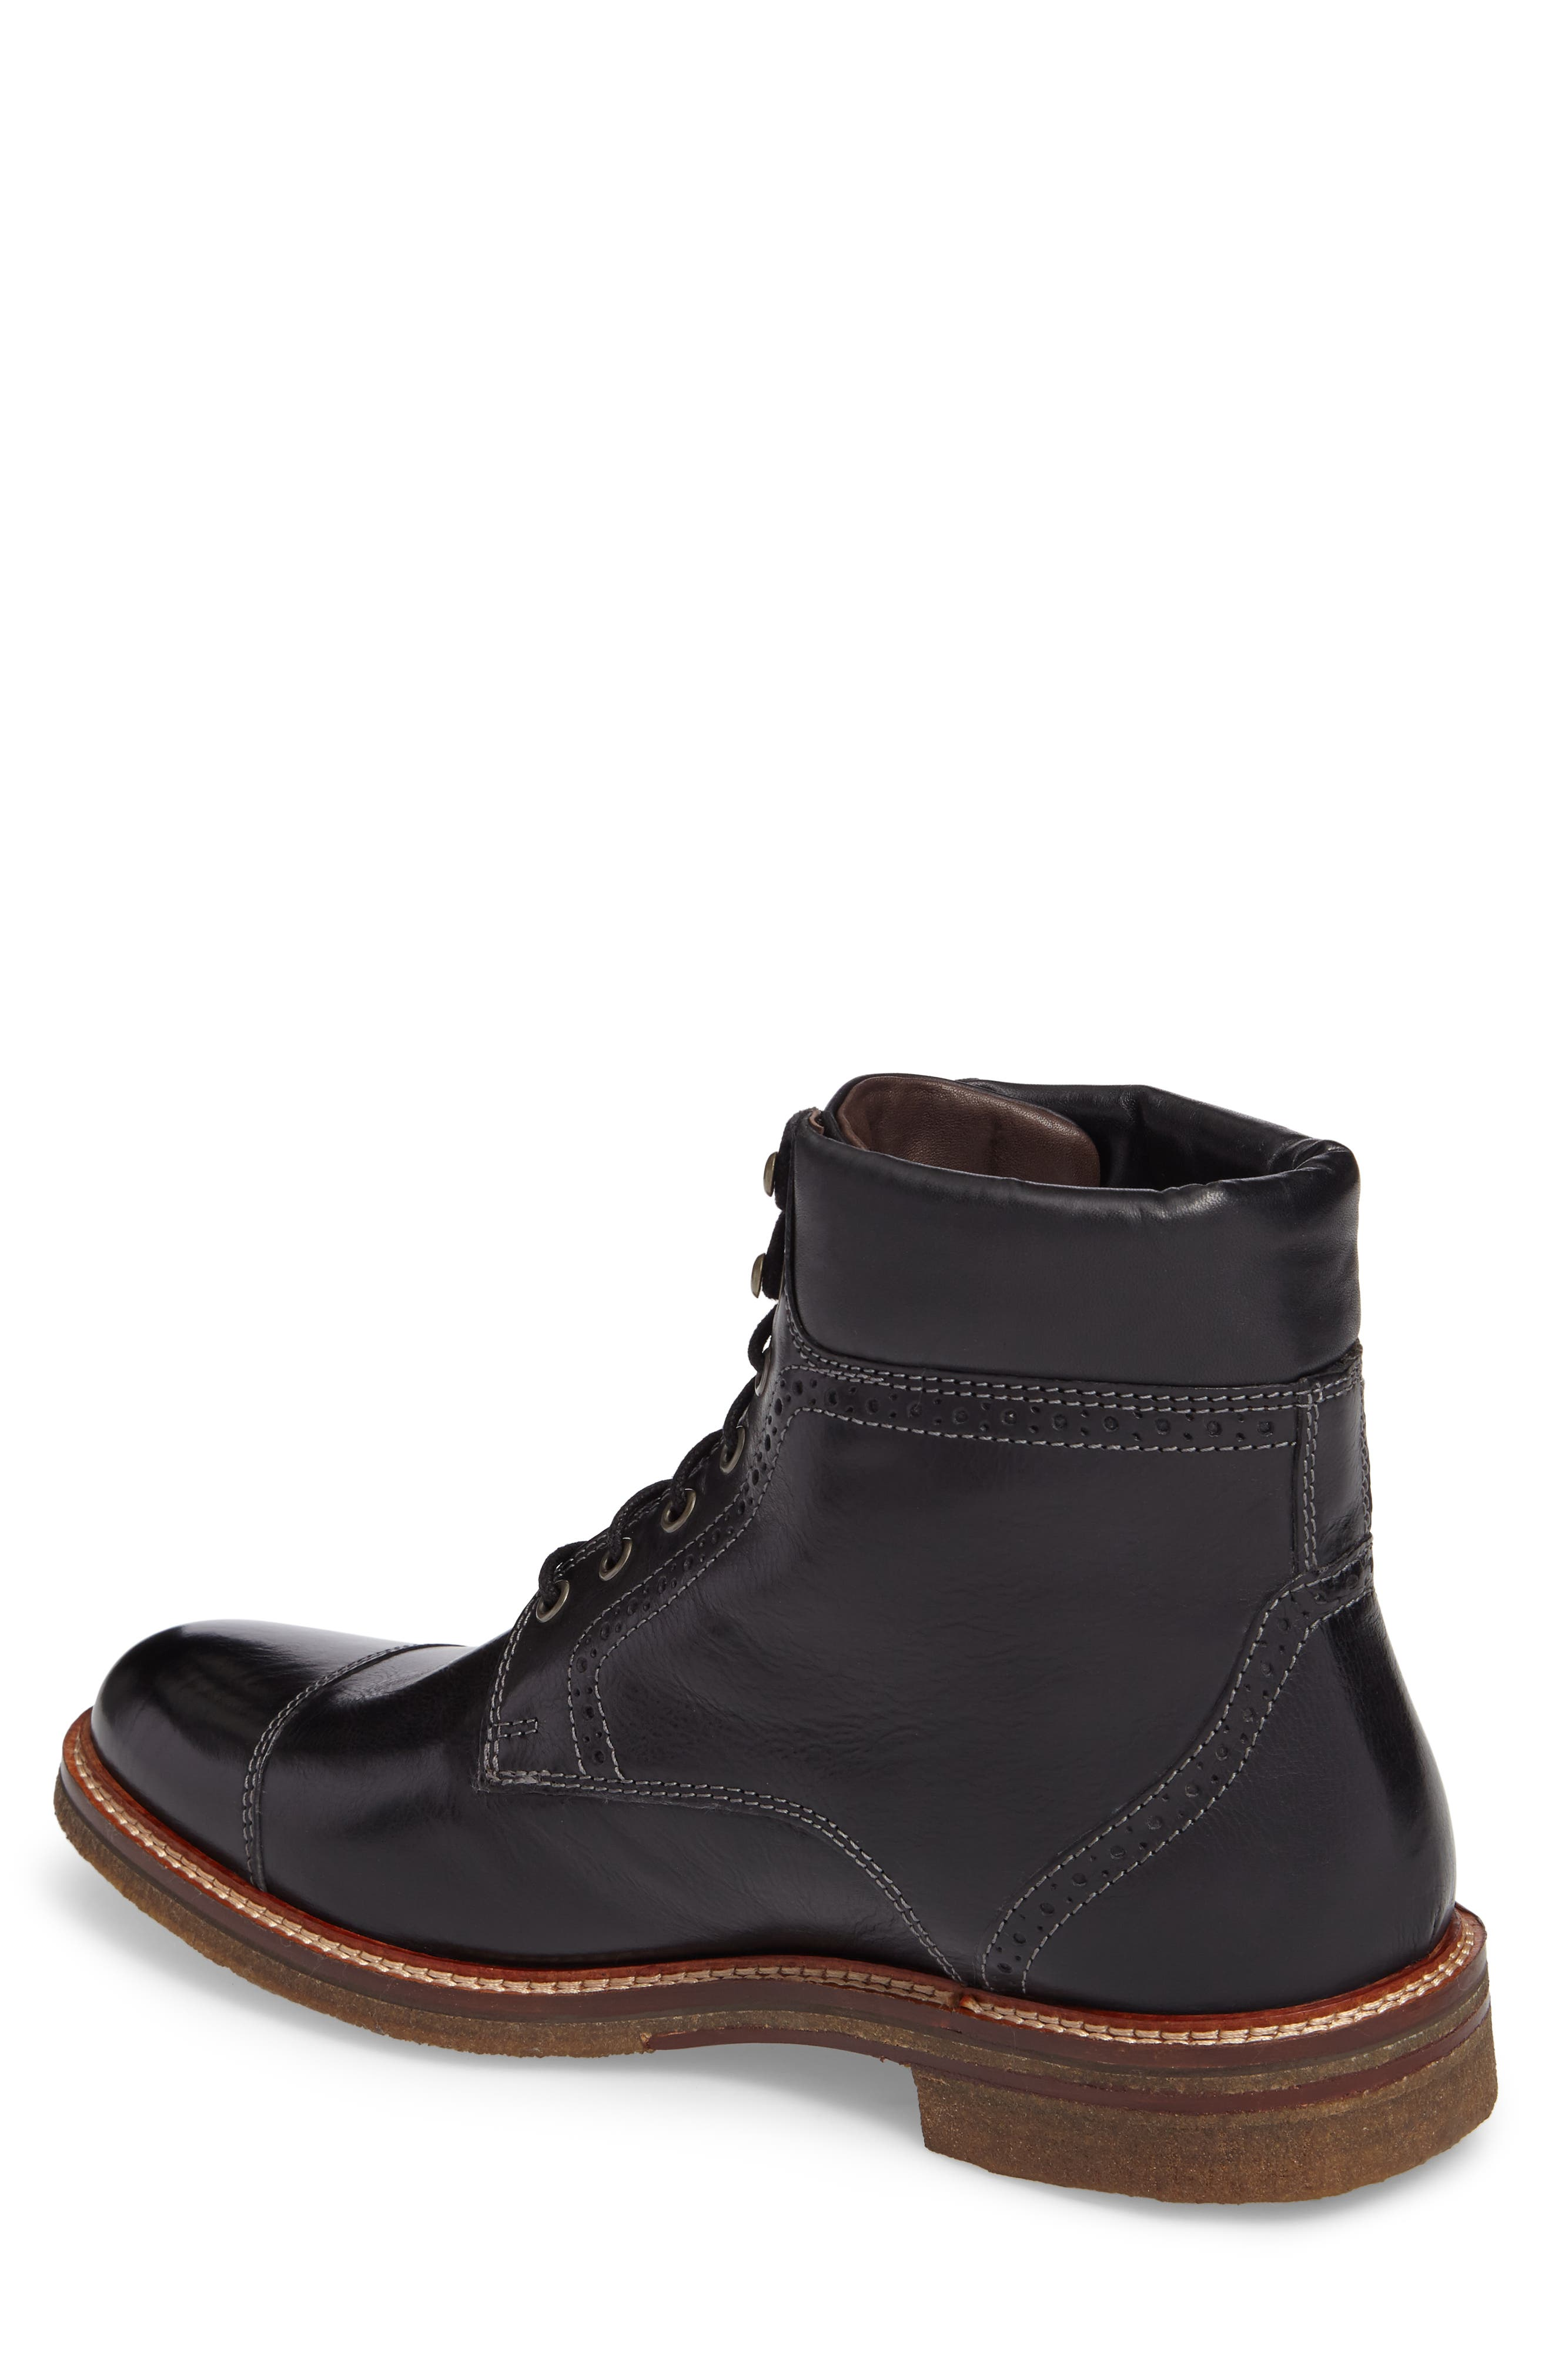 Forrester Cap Toe Boot,                             Alternate thumbnail 2, color,                             BLACK LEATHER